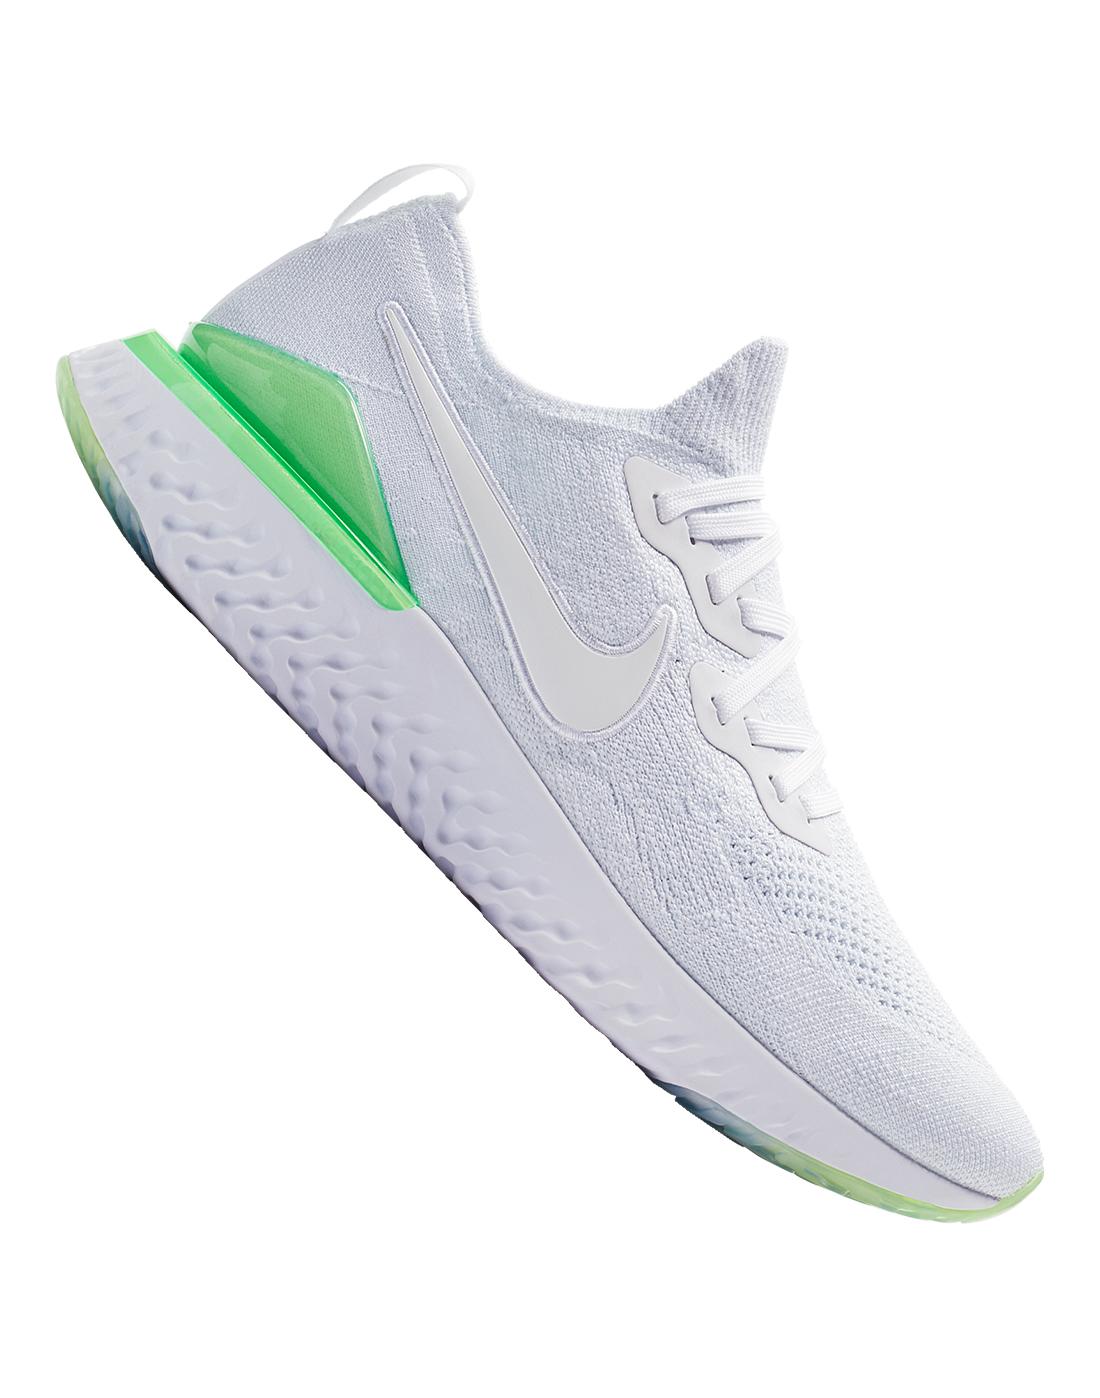 74c62a4d884f0 Nike Mens Epic React Flyknit 2